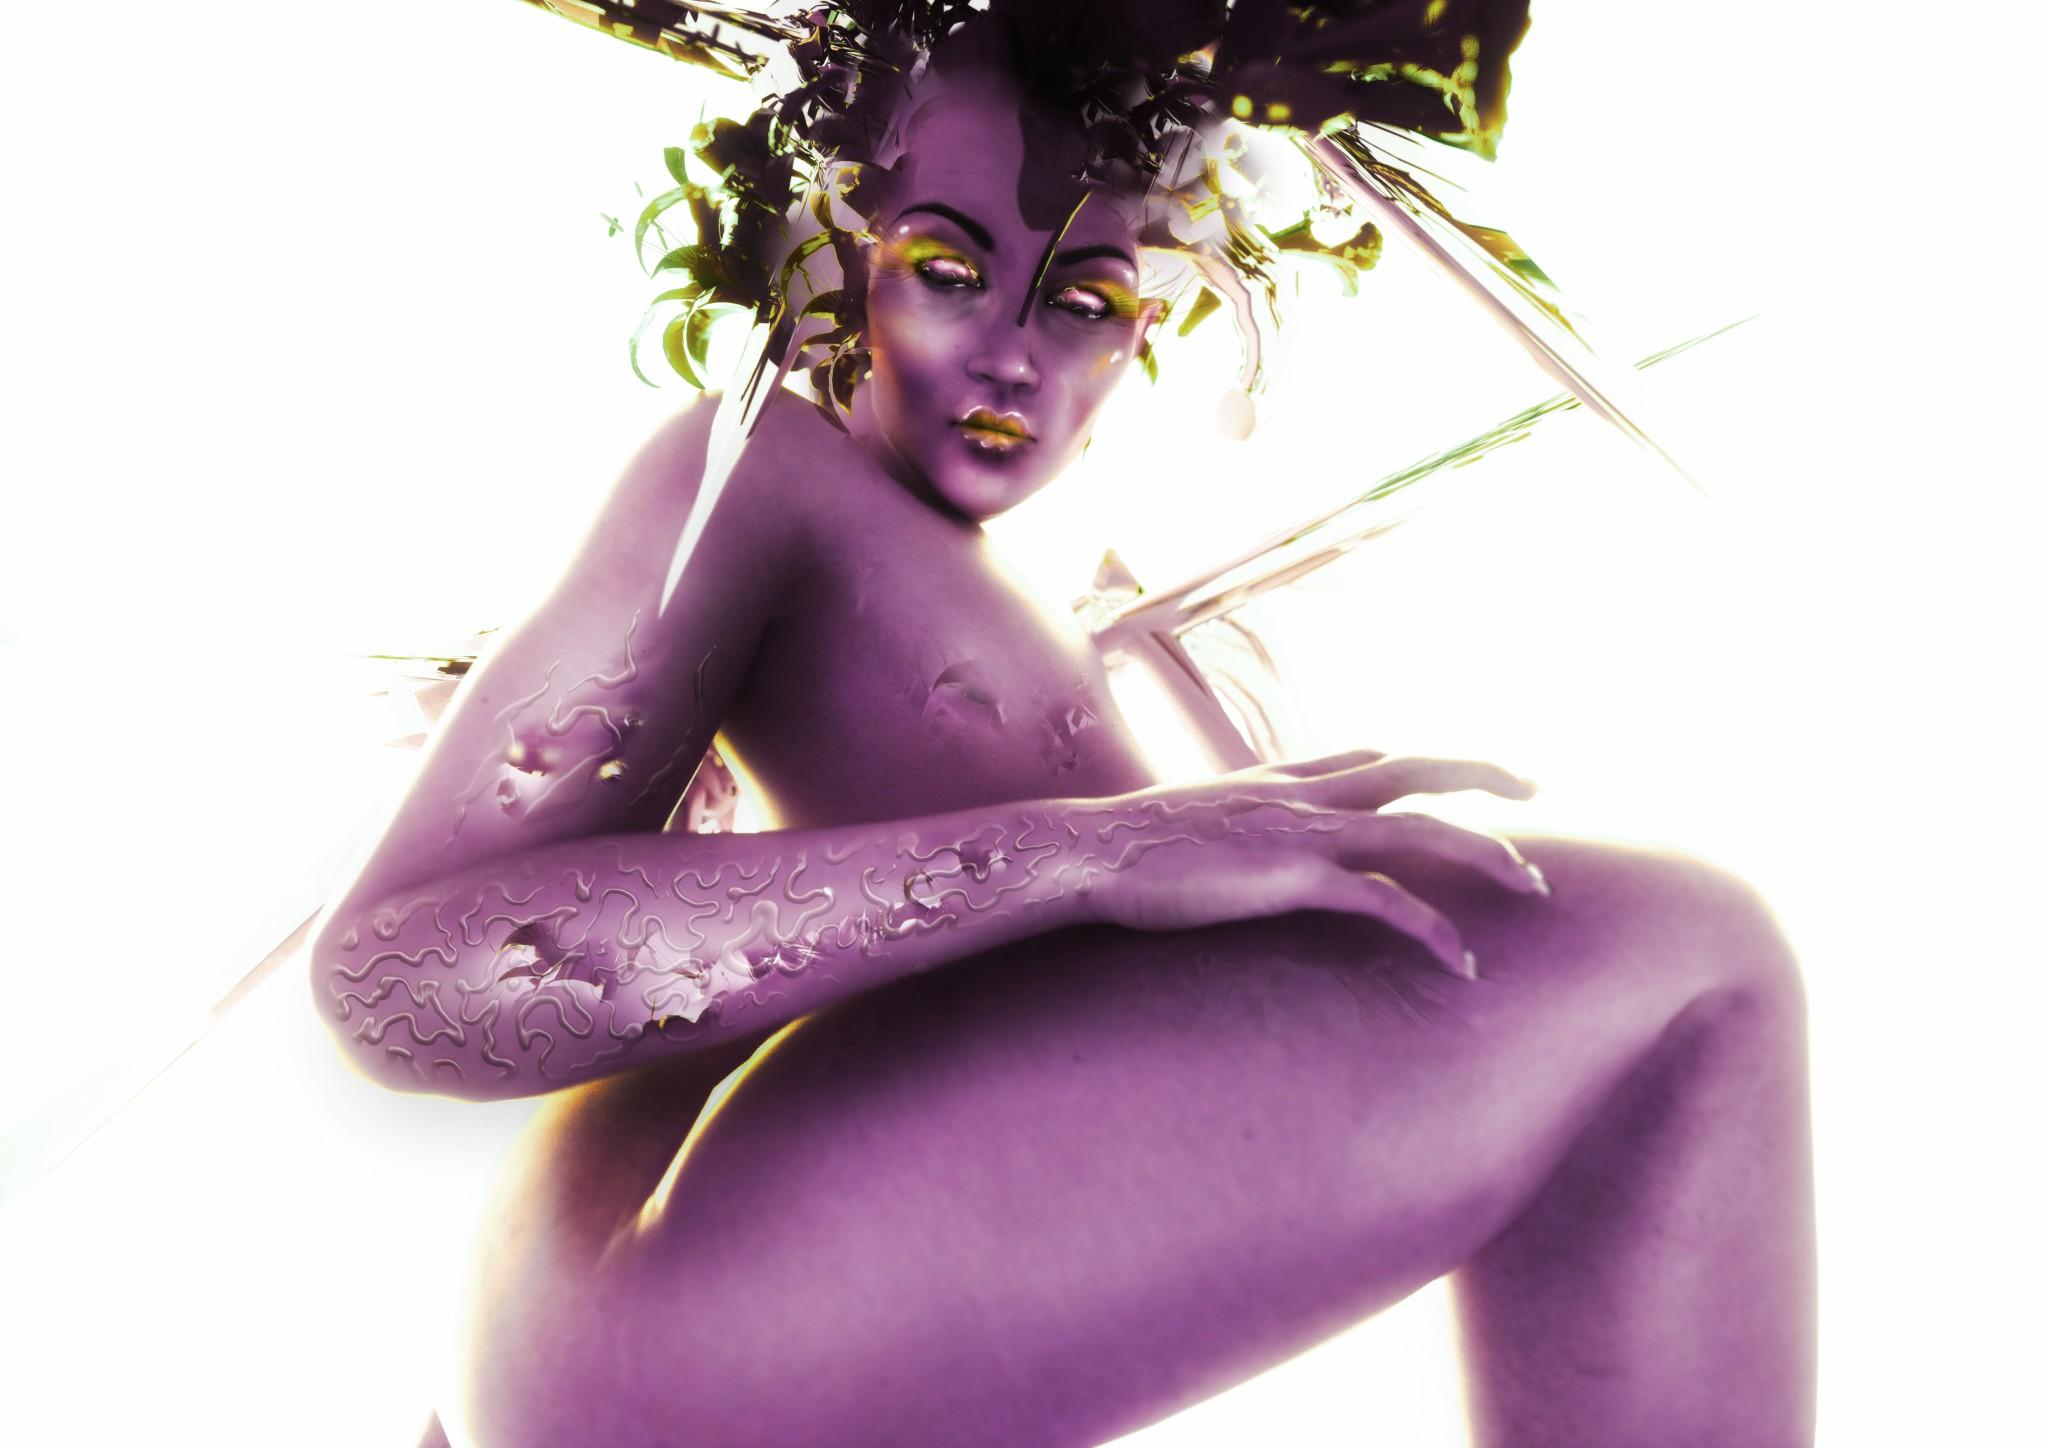 Nora Smith : « Filmer des corps libres ? C'est l'extase !  »